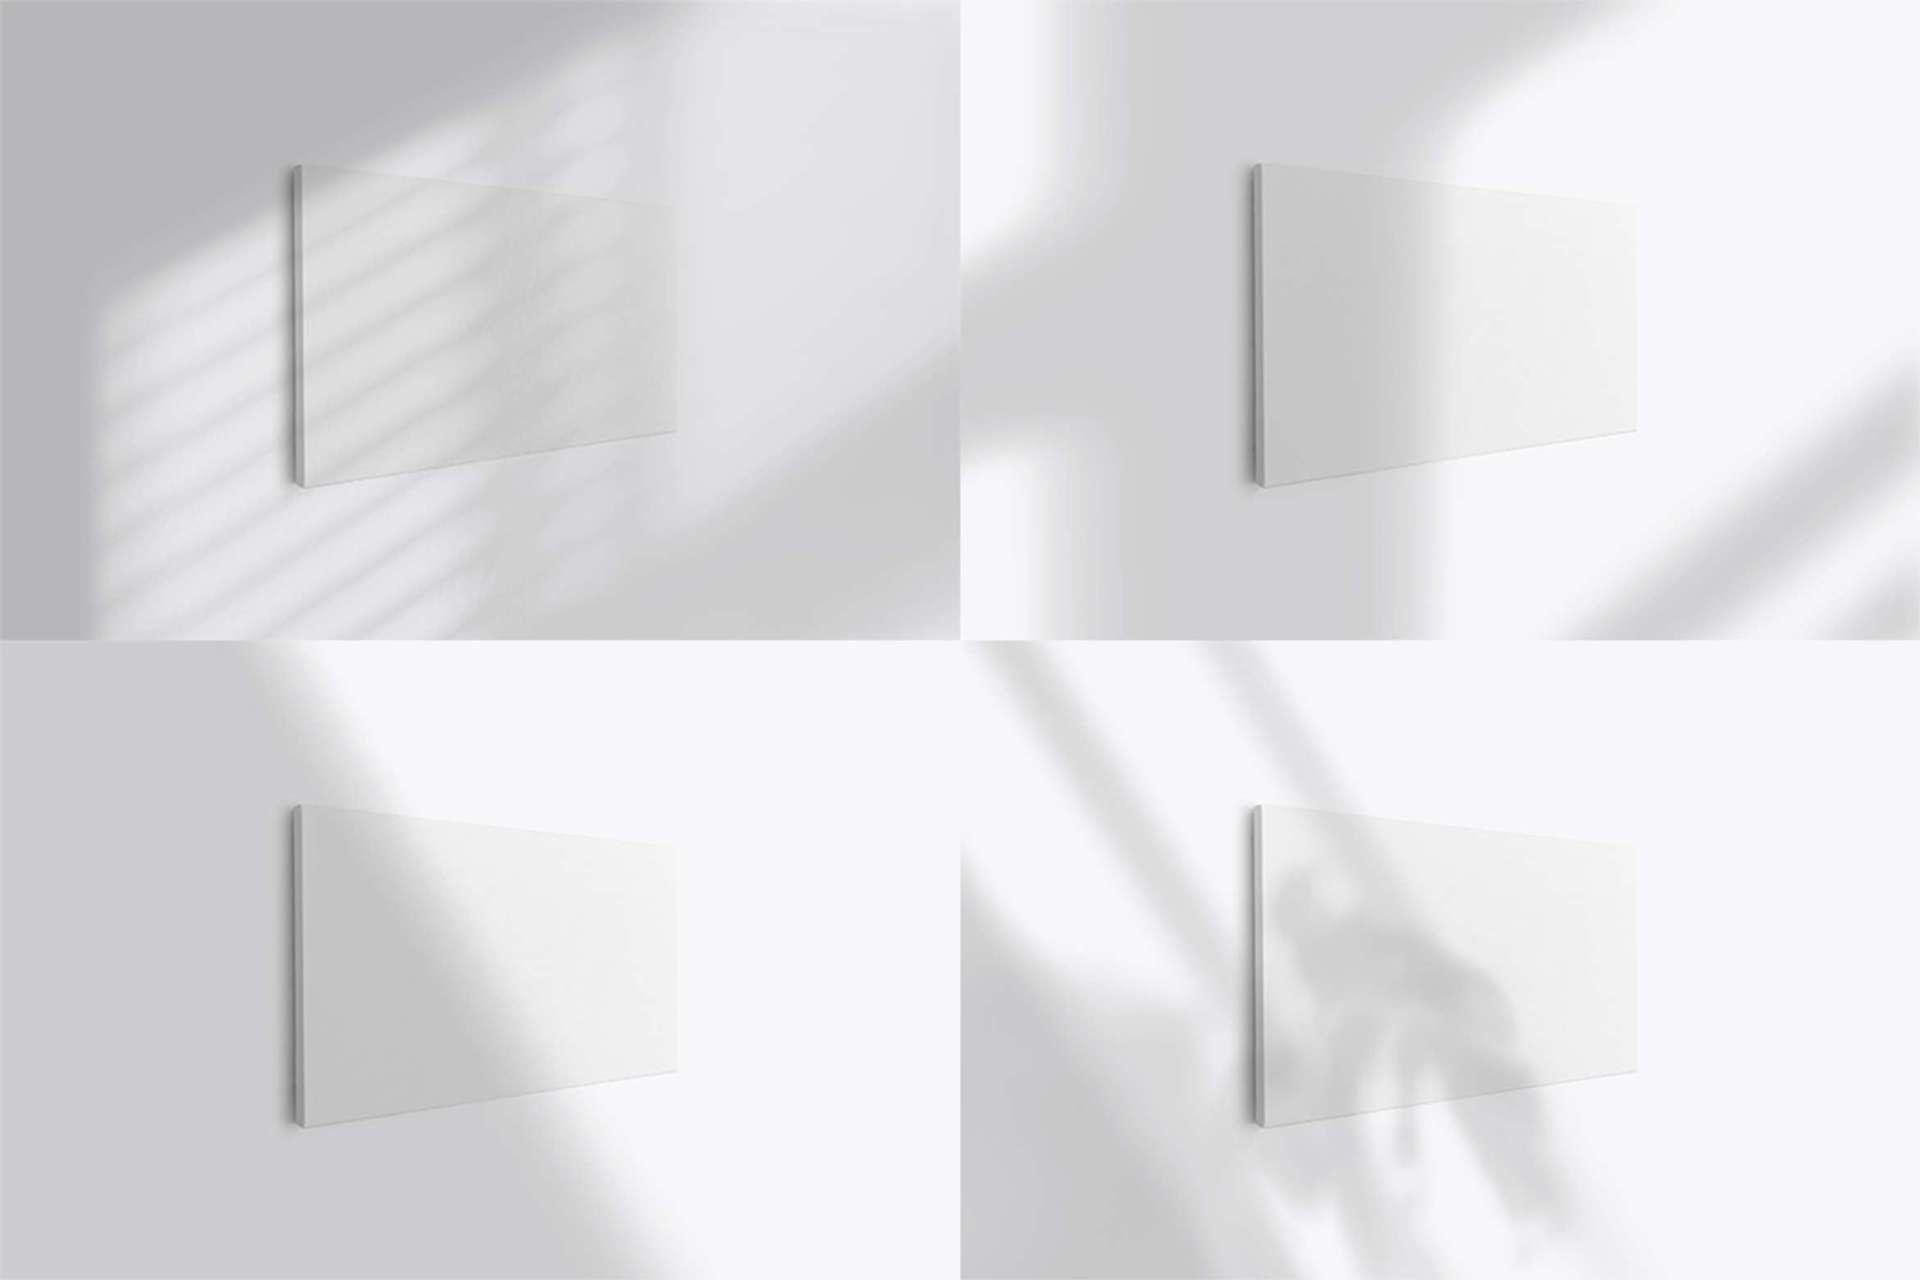 Thin Landscape Canvas Ratio 2x1 Mockup